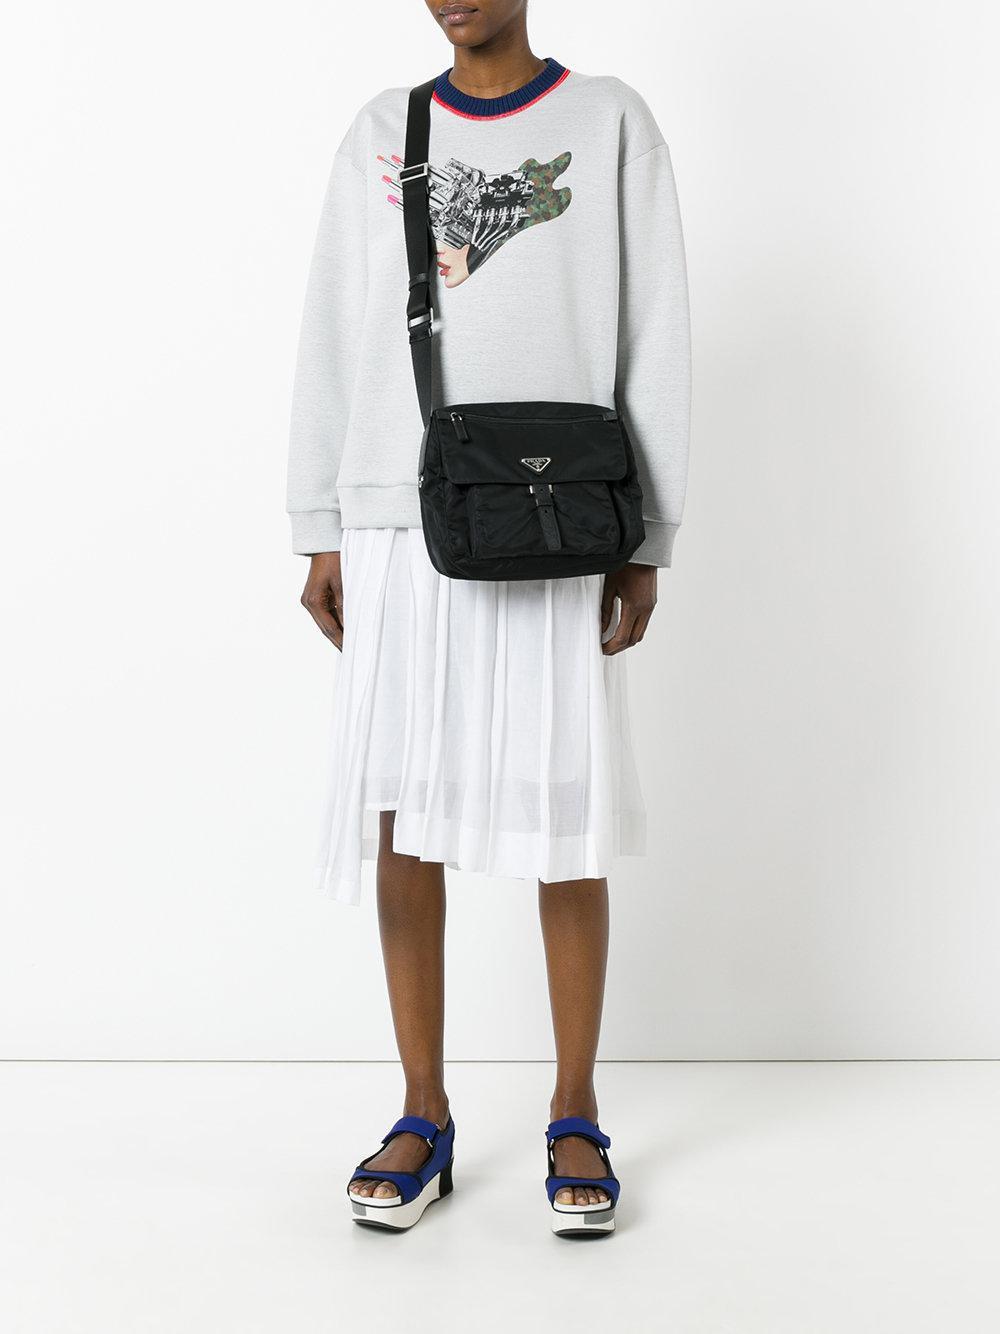 4e0abb796f Prada - Logo Plaque Cross Body Bag - Women - Nylon - One Size in Black -  Lyst